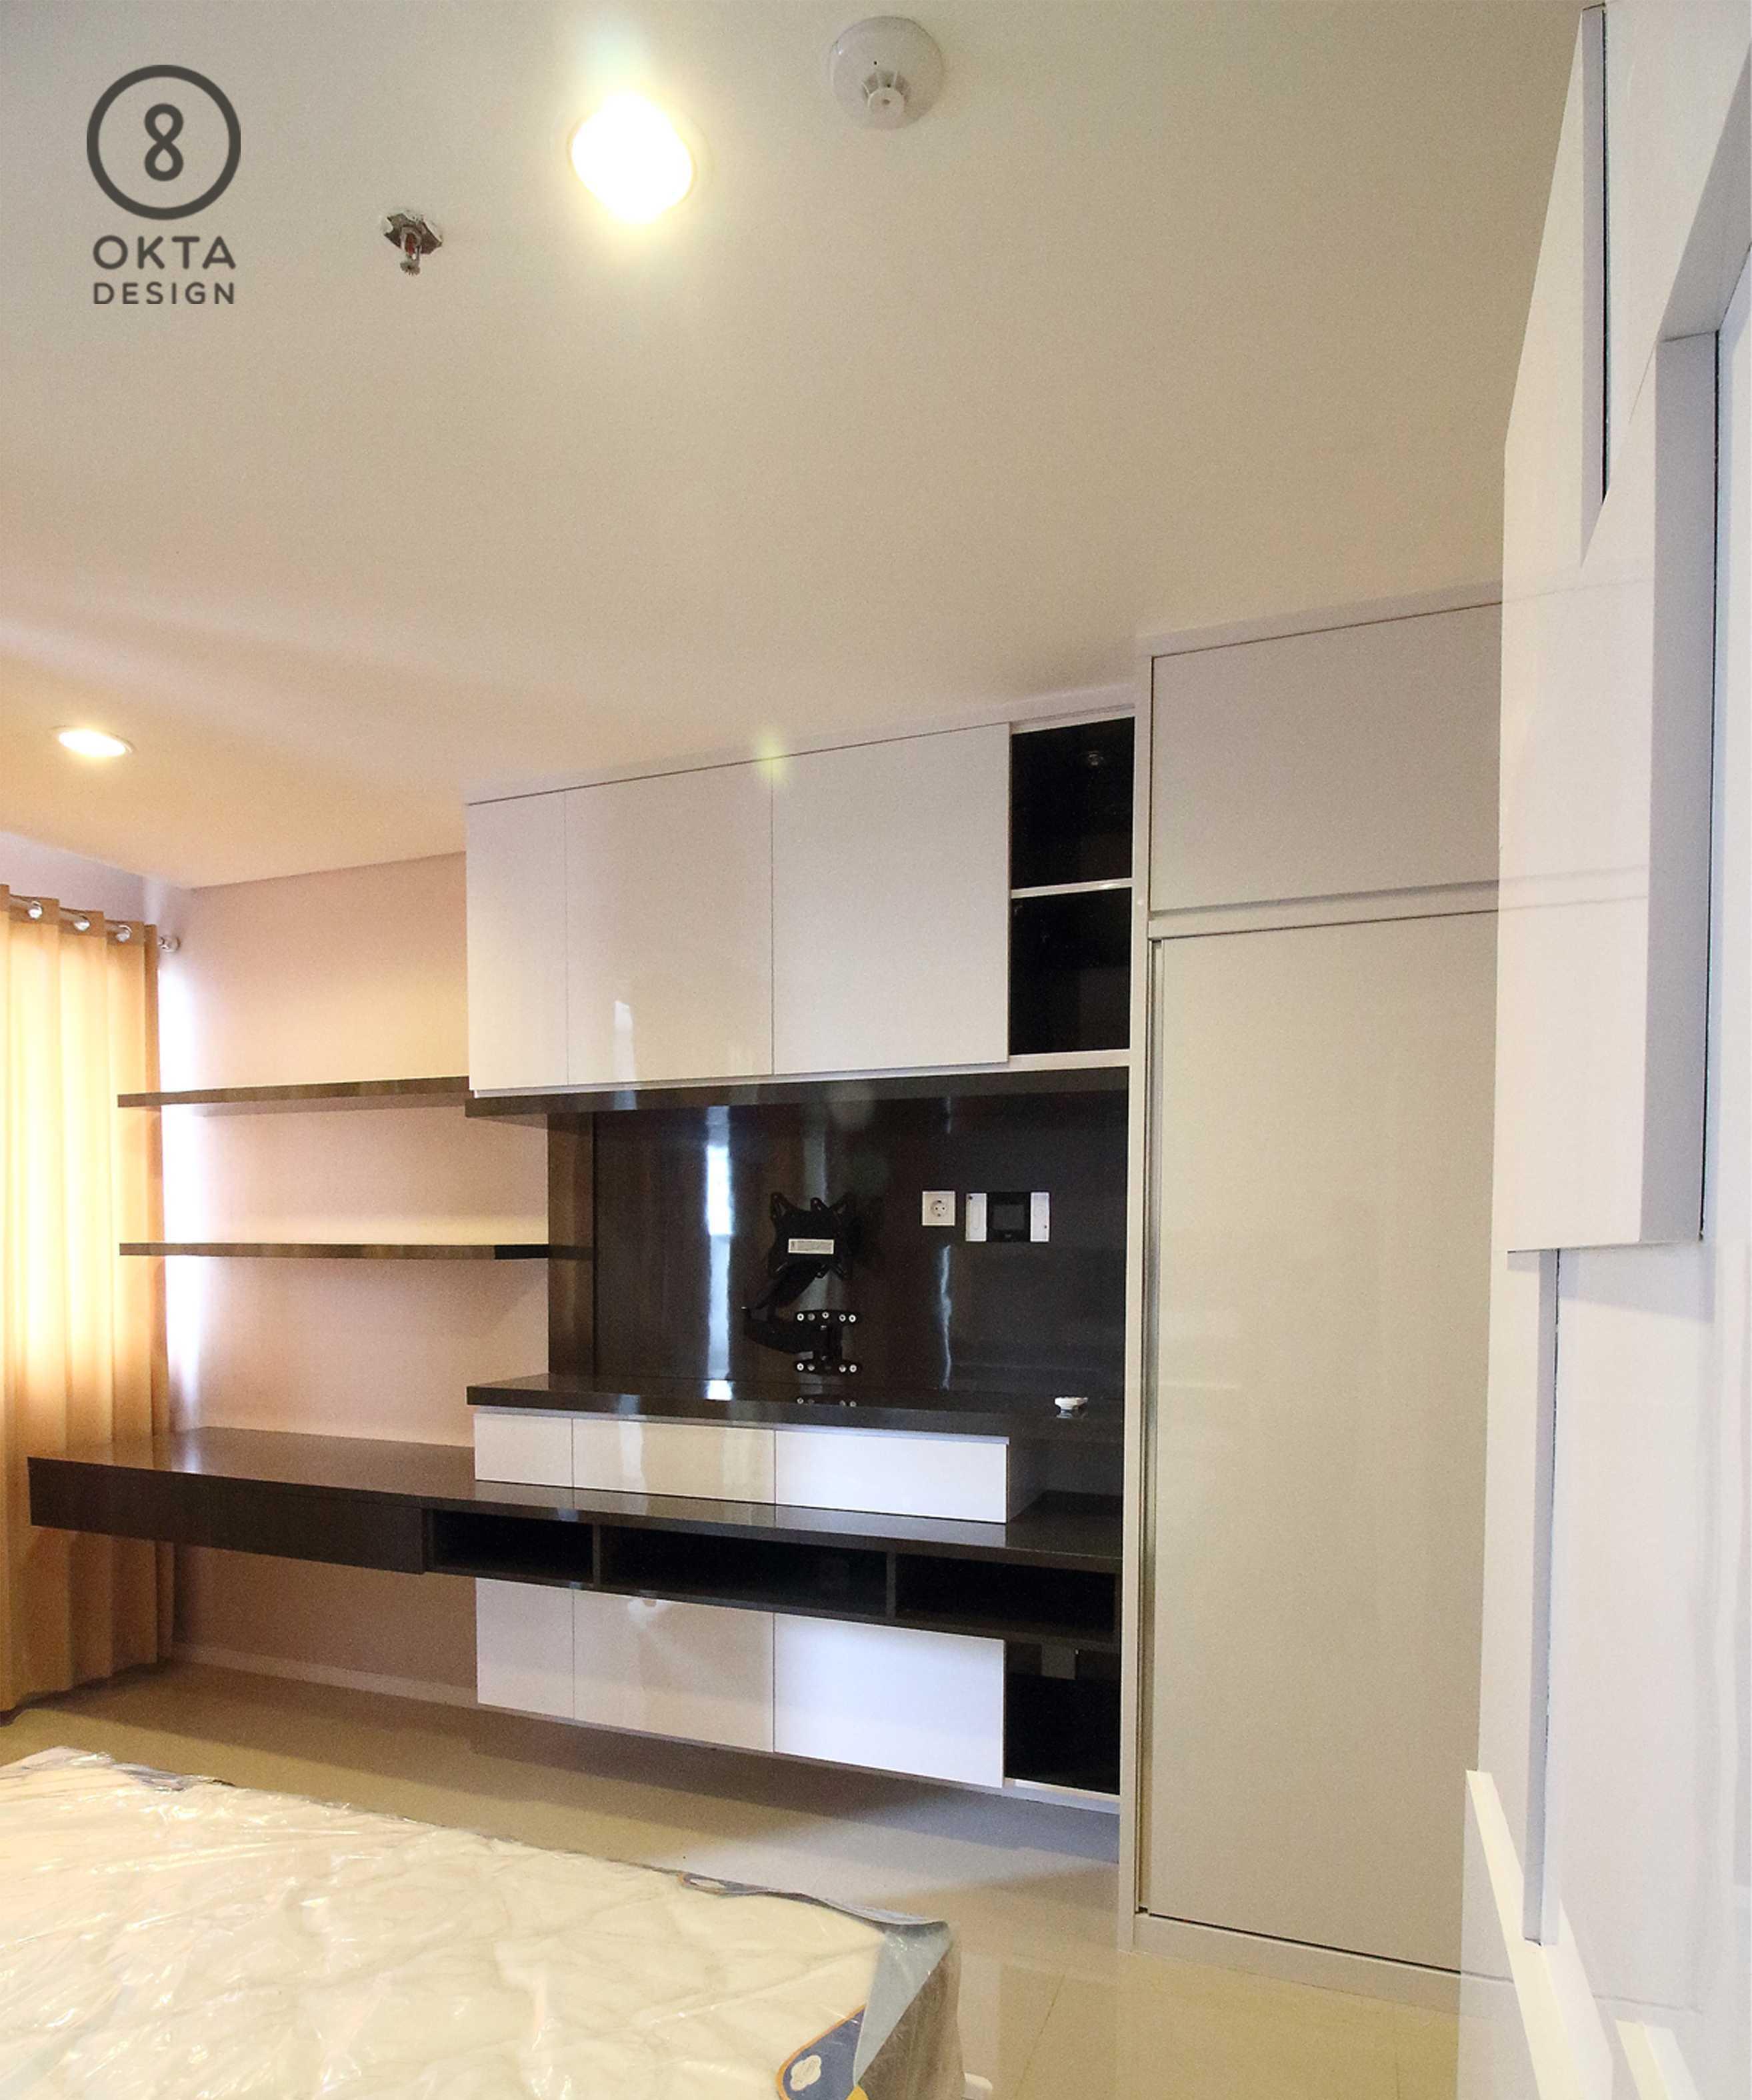 Okta Design Glossy White Studio Room Pondok Jagung, North Serpong, South Tangerang City, Banten 15326, Indonesia Pondok Jagung, North Serpong, South Tangerang City, Banten 15326, Indonesia Aa5 Minimalis,modern  32185